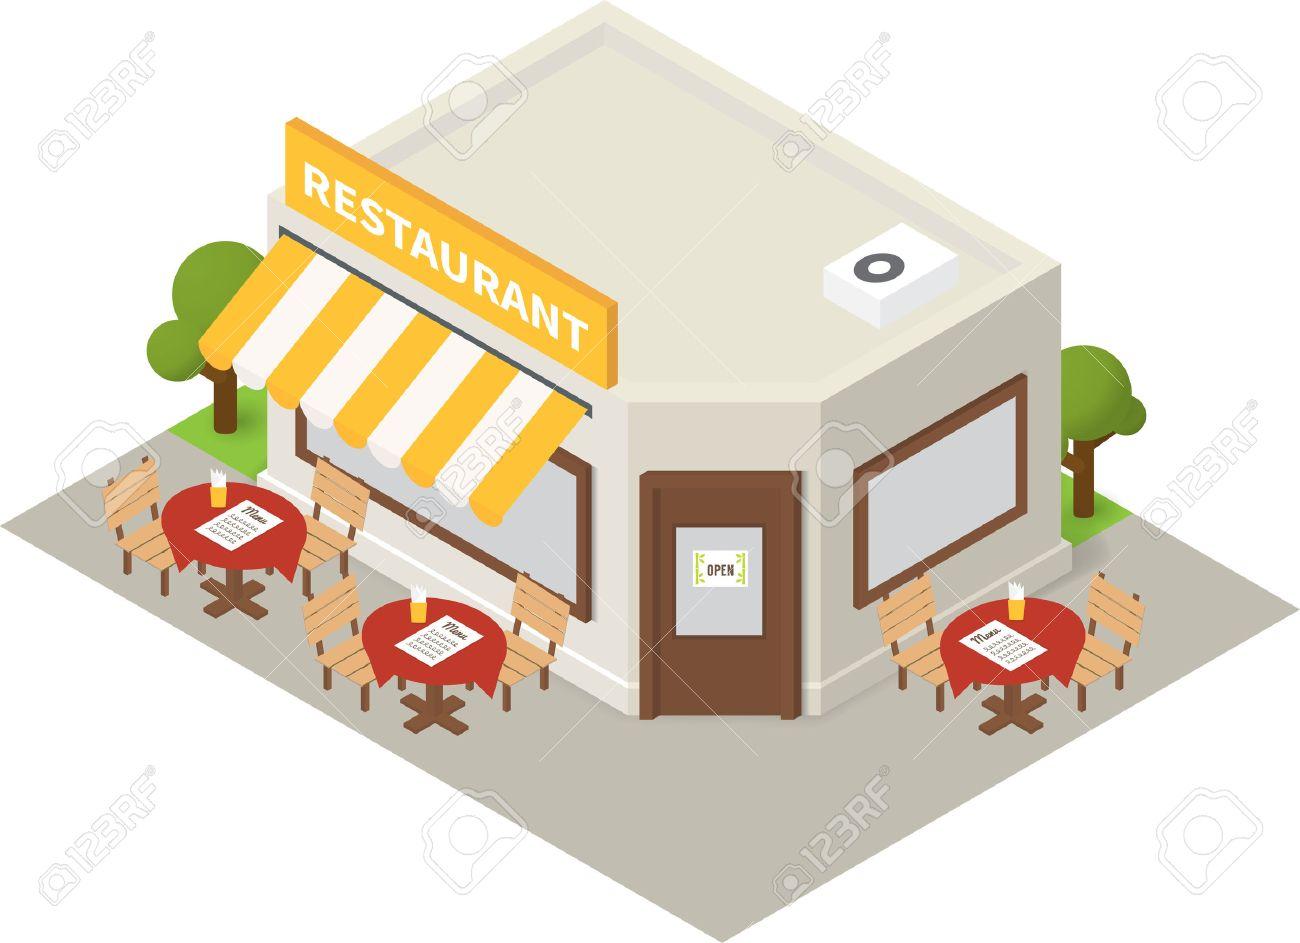 Building cartoon clipart restaurant building and restaurant building - Isometric Restaurant Cafe Flat Building Icon Stock Vector 50120504